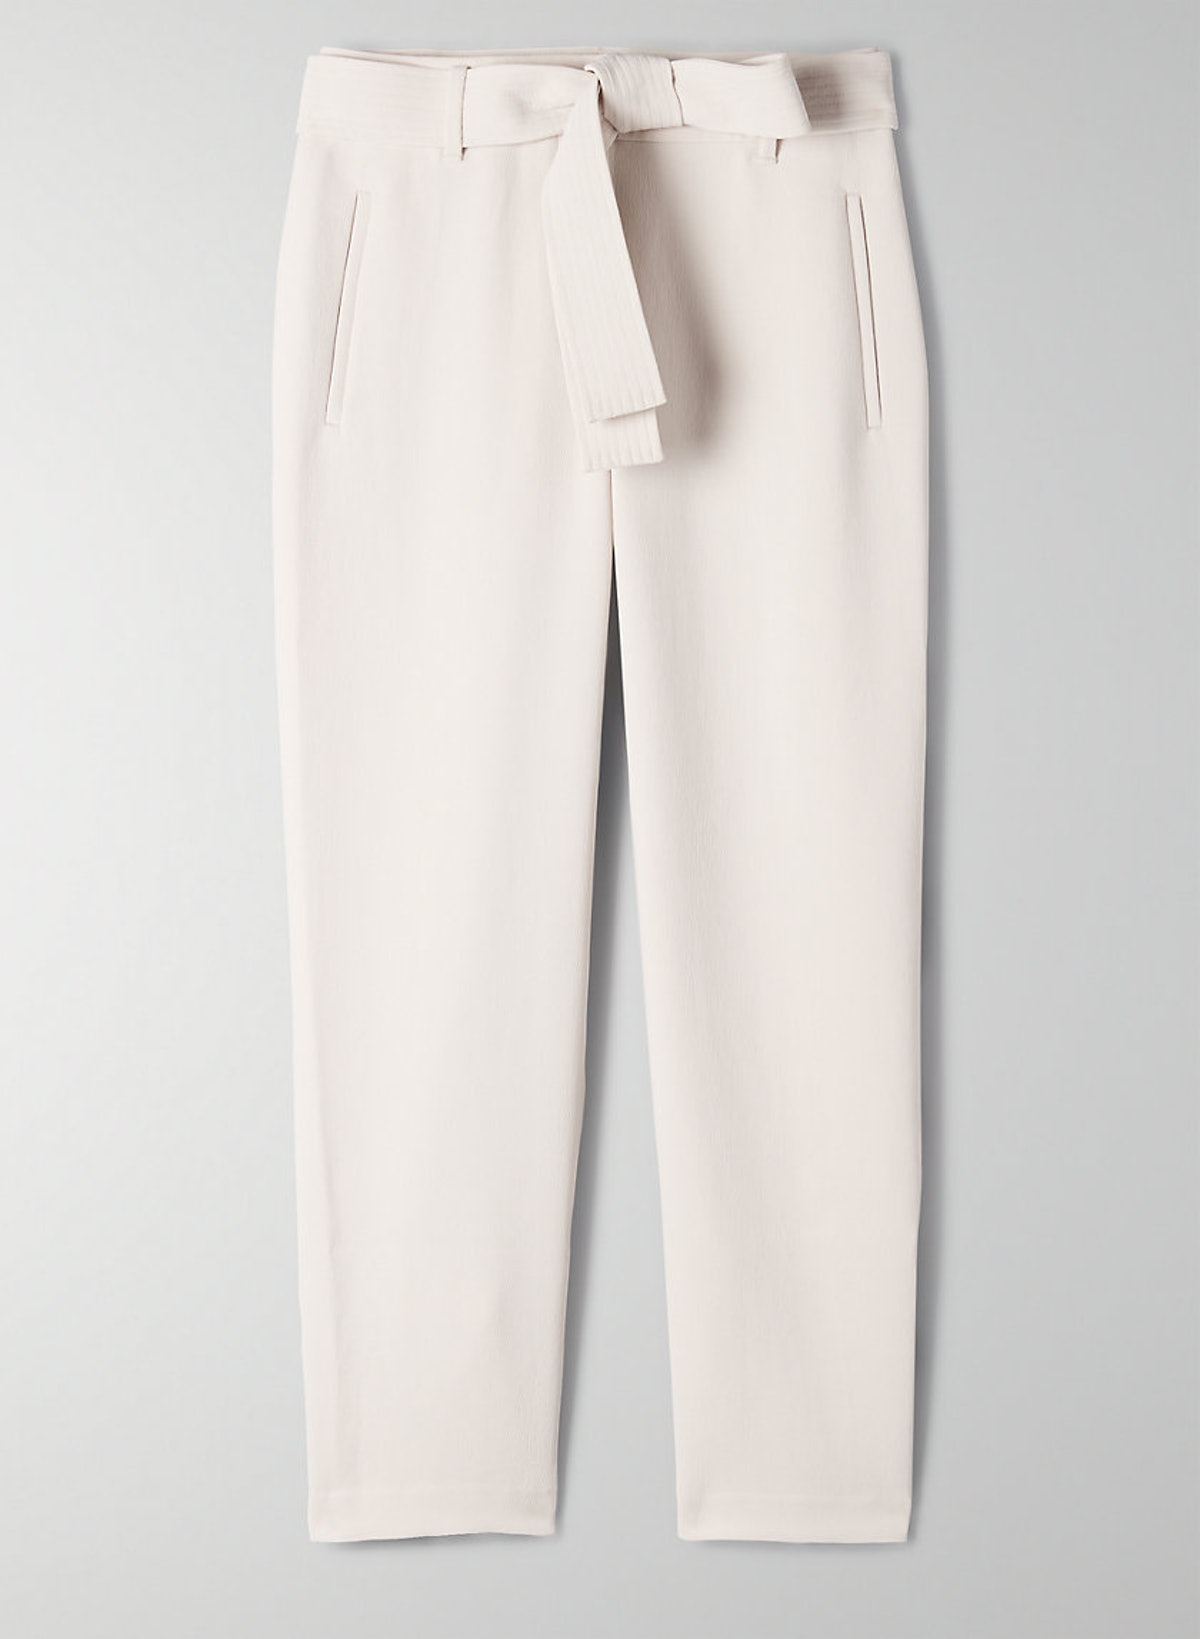 Tie-Front Pant